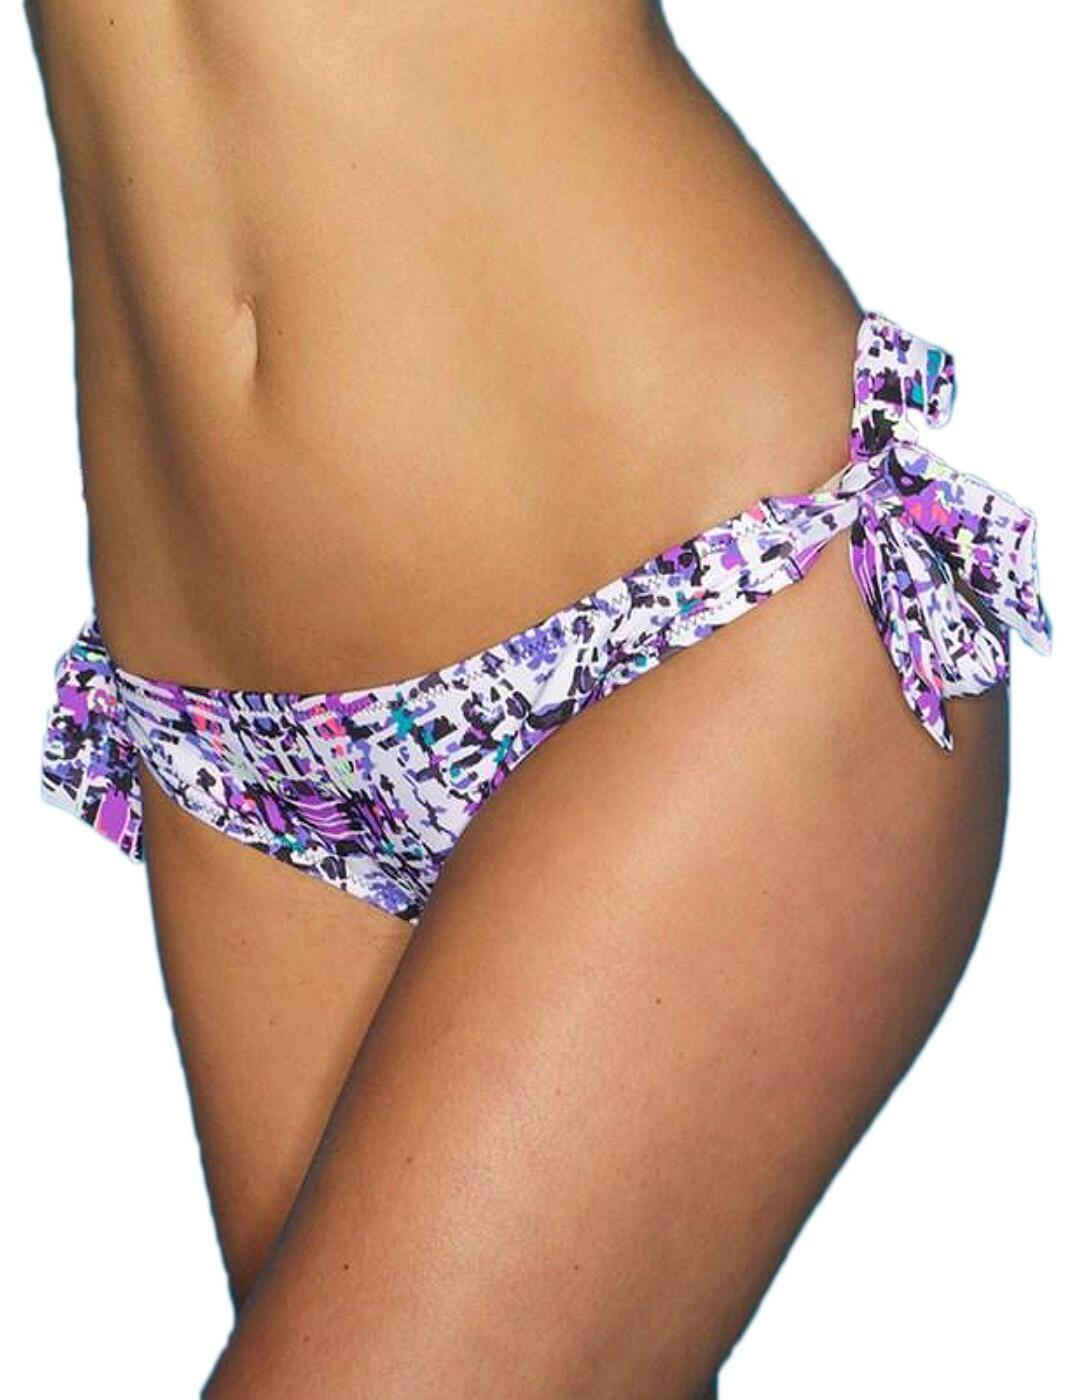 92004 Pour Moi? Mykonos Tie Side Bikini Brief - 92004 Multi